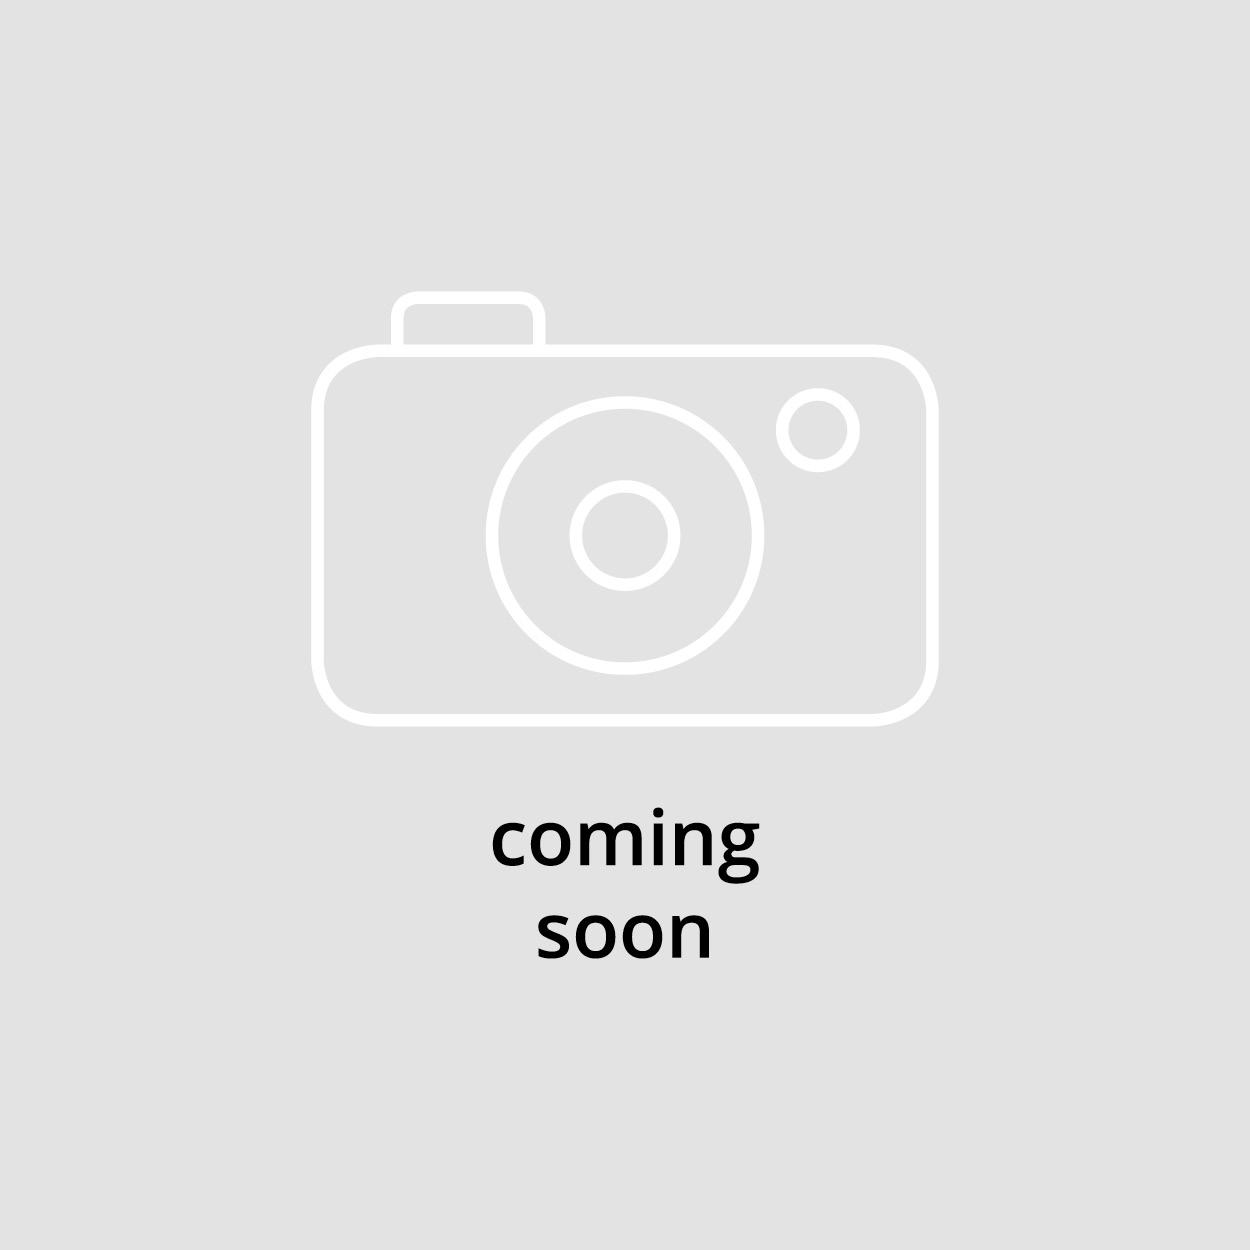 VA60 Anello di tenuta per Gildemeister AS16*, AS20*, GS20, GM20, GM20AC